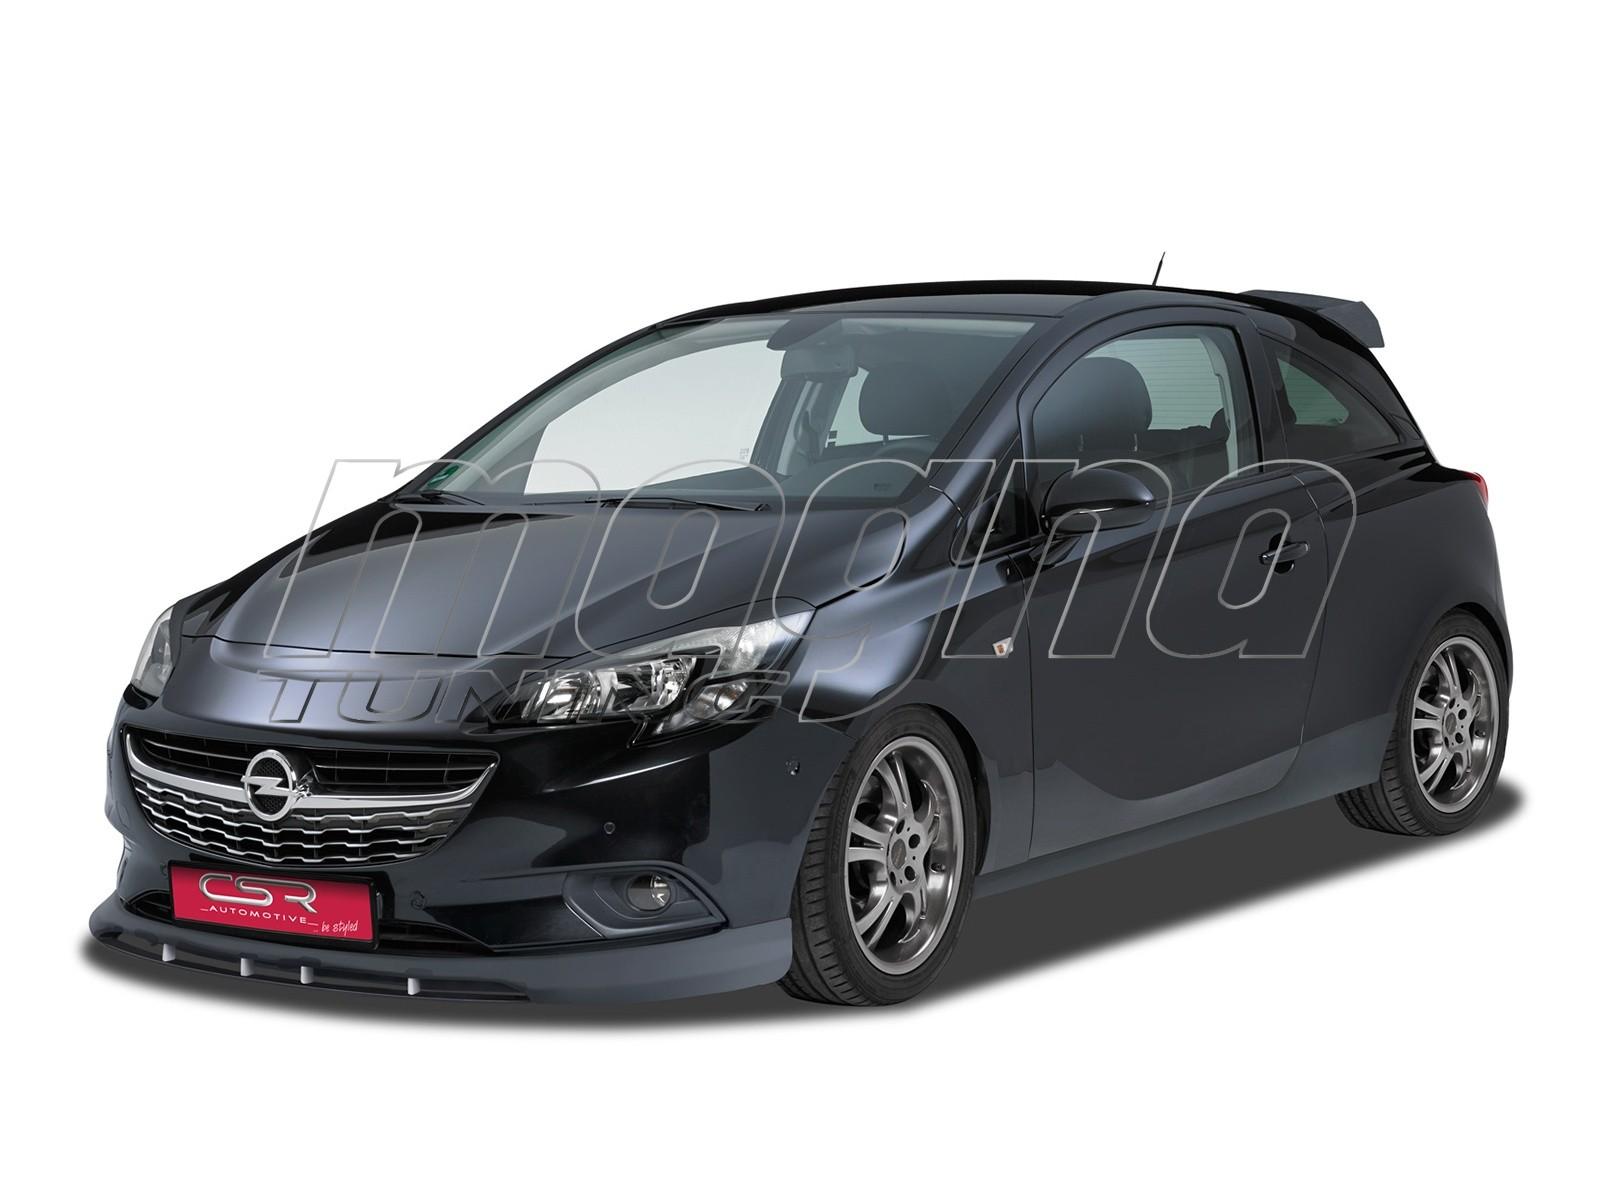 Opel Corsa E Crono Front Bumper Extension